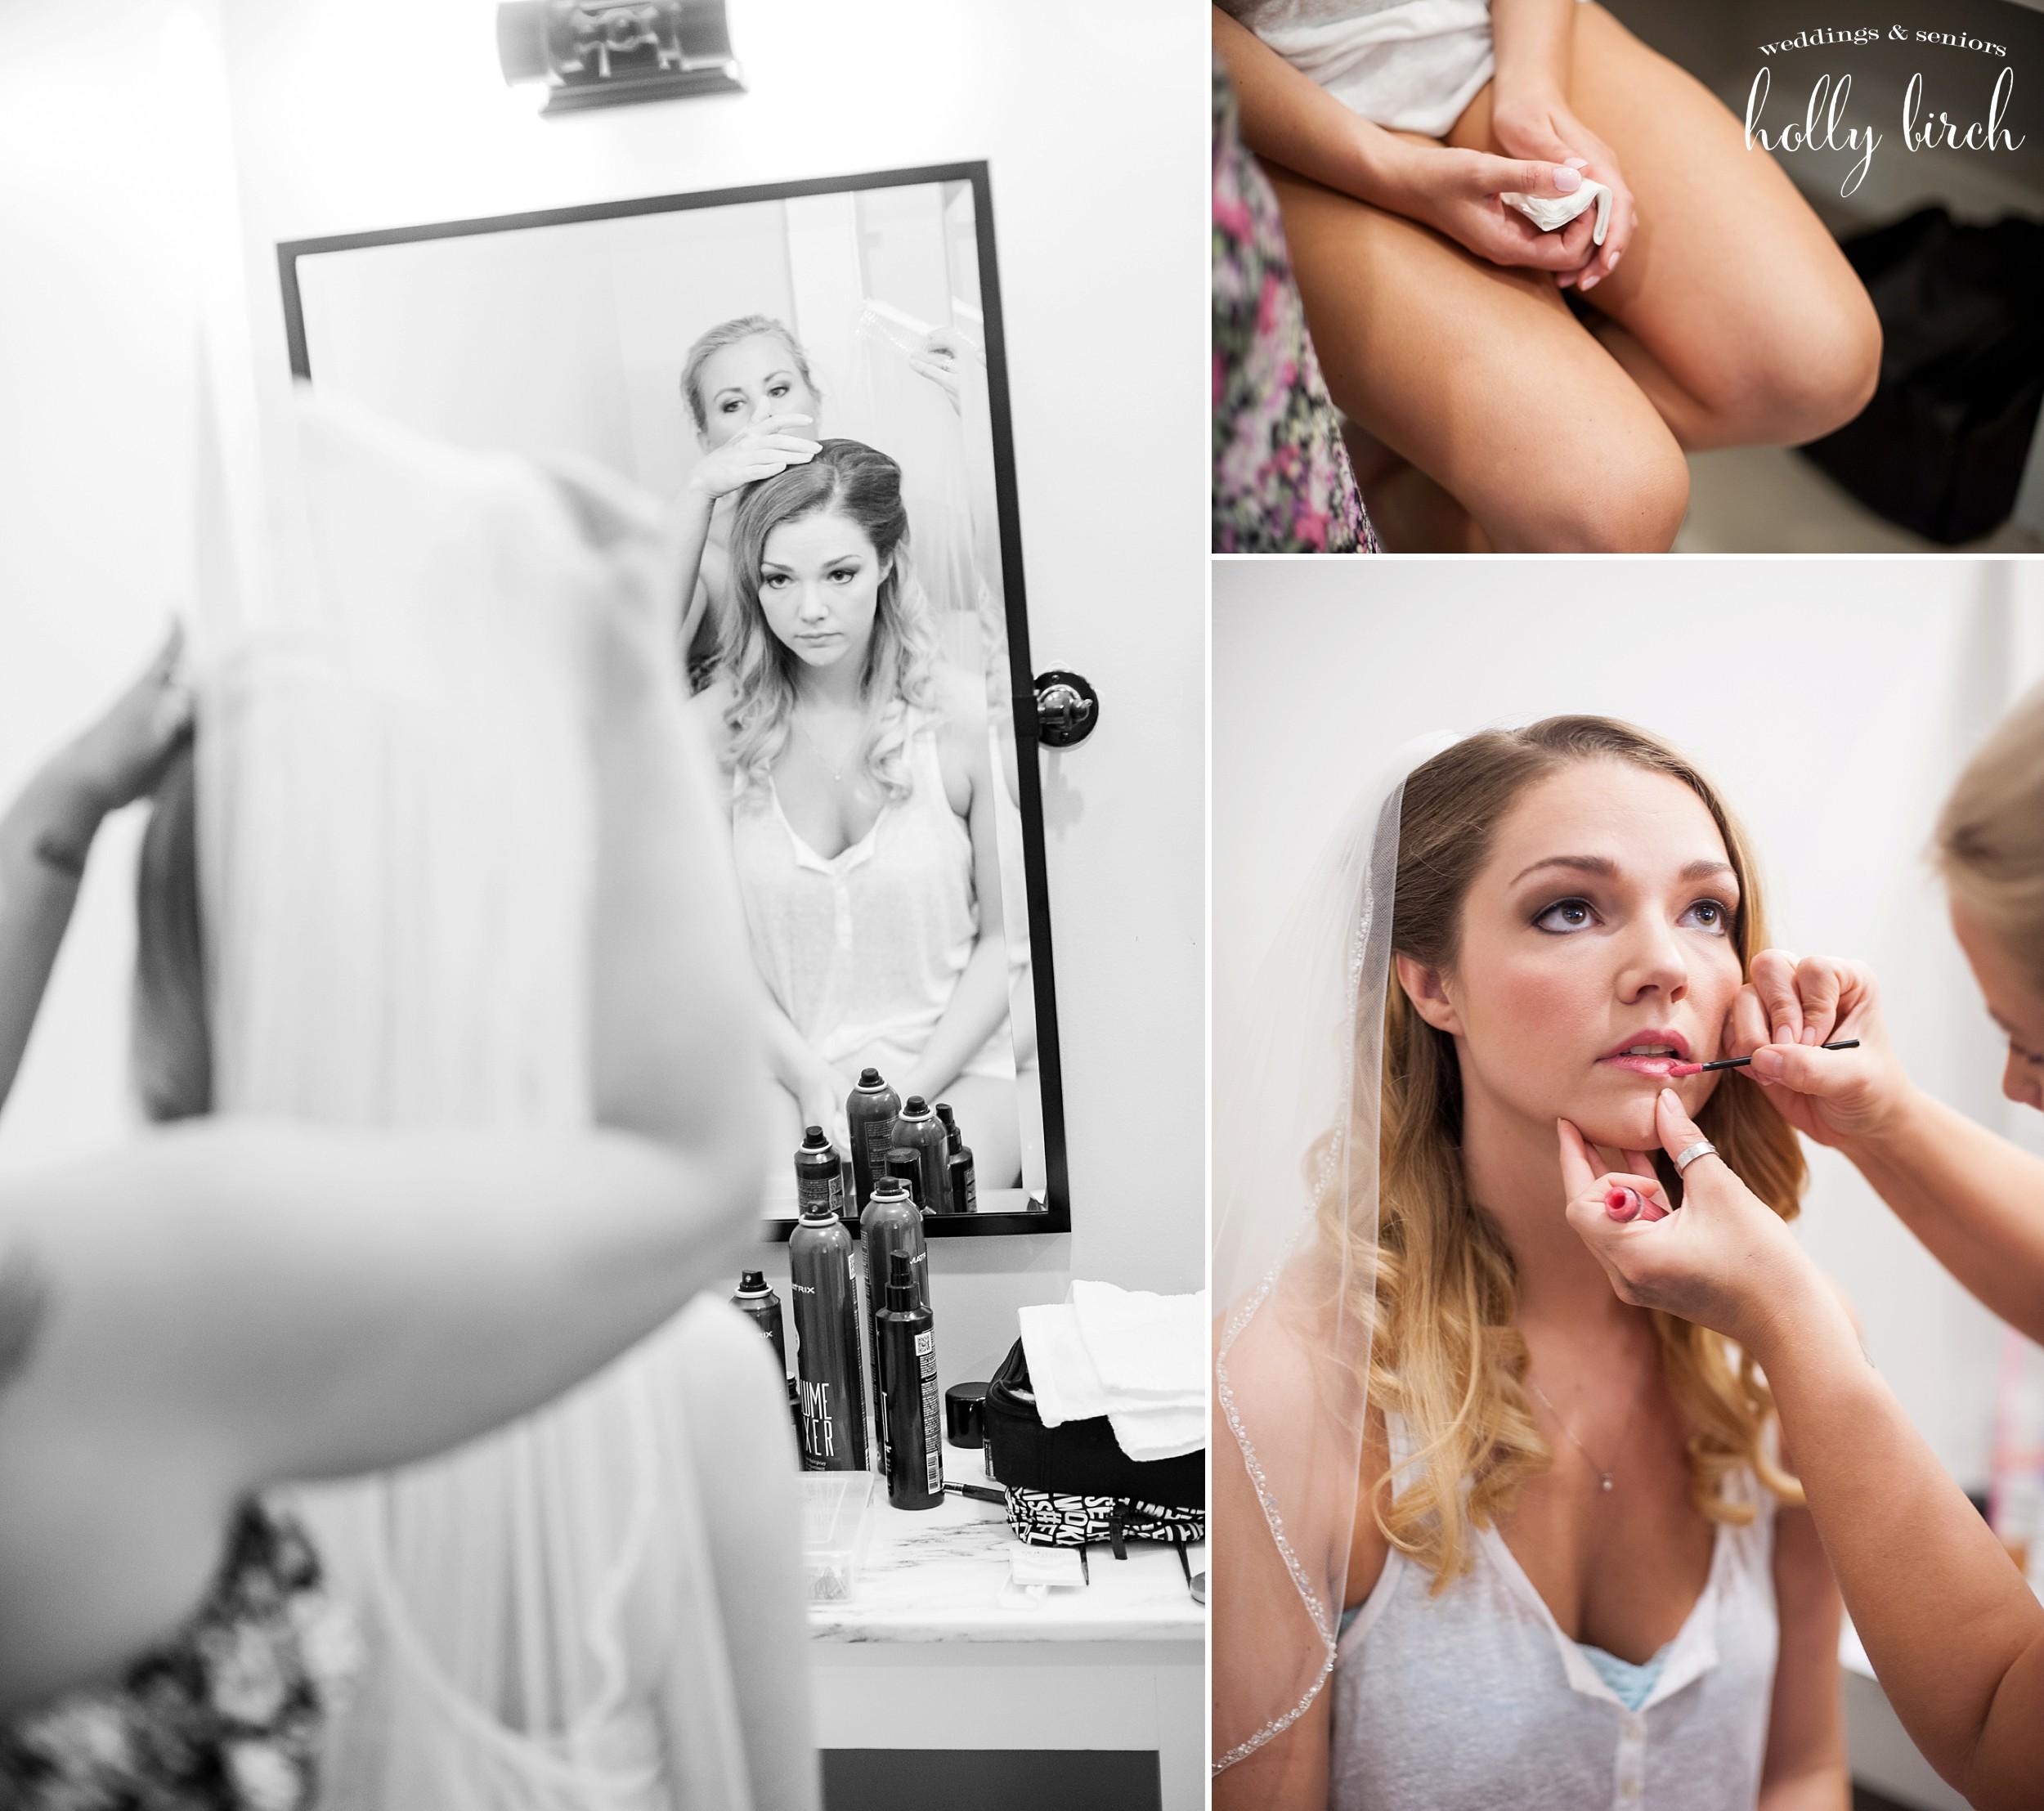 Rod Sickler salon doing bride's makeup